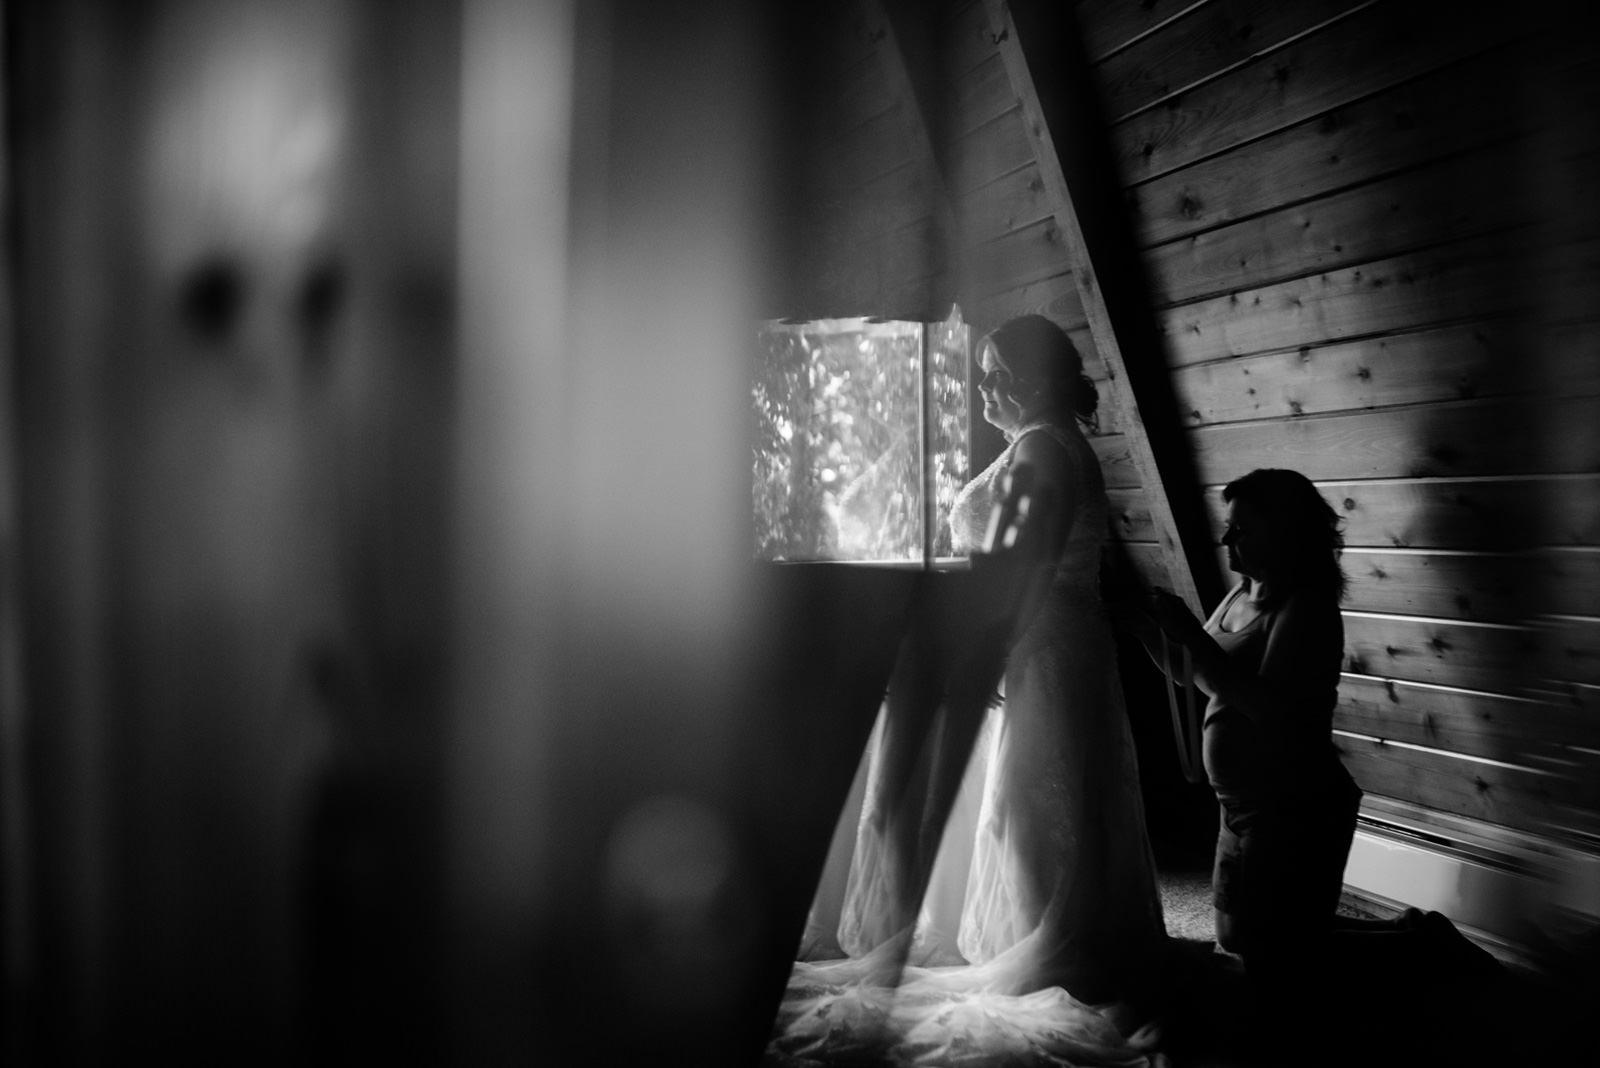 bride putting on wedding dress oberports wv photojournalism